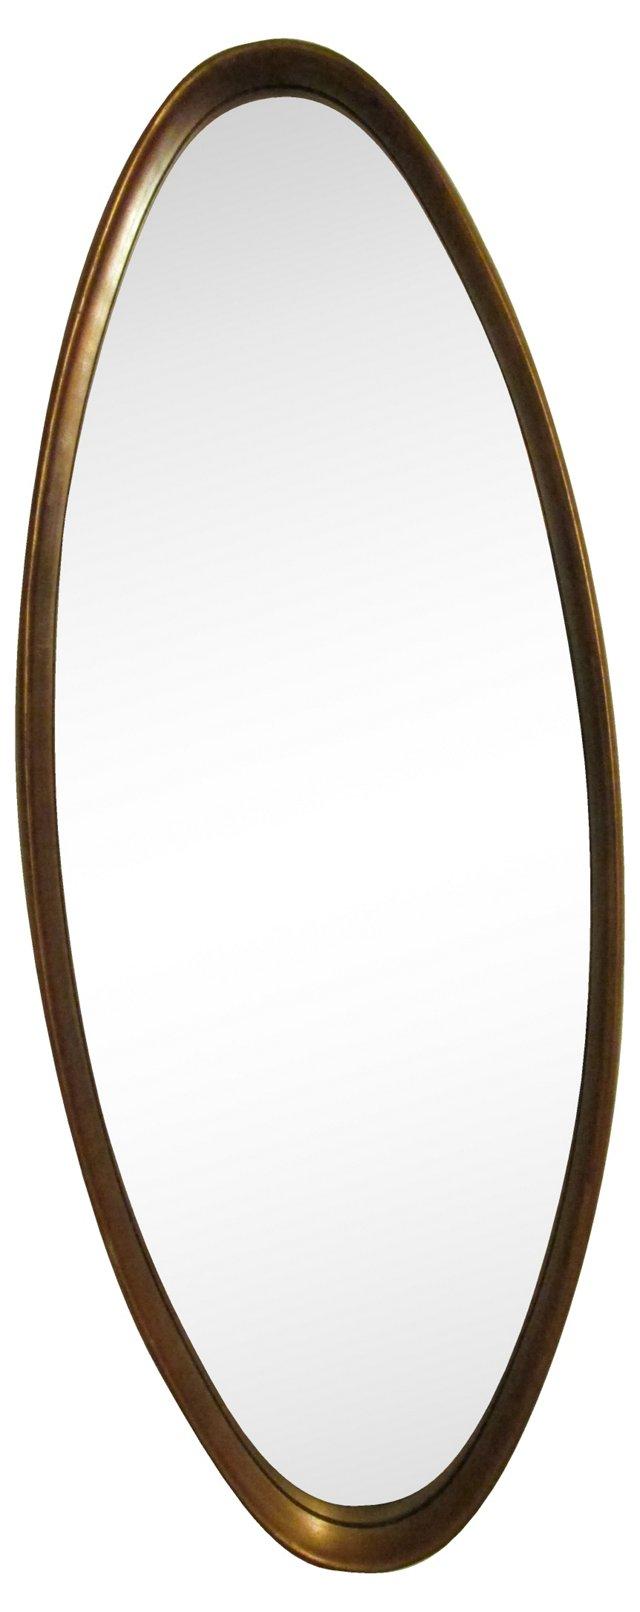 Midcentury Oval Mirror